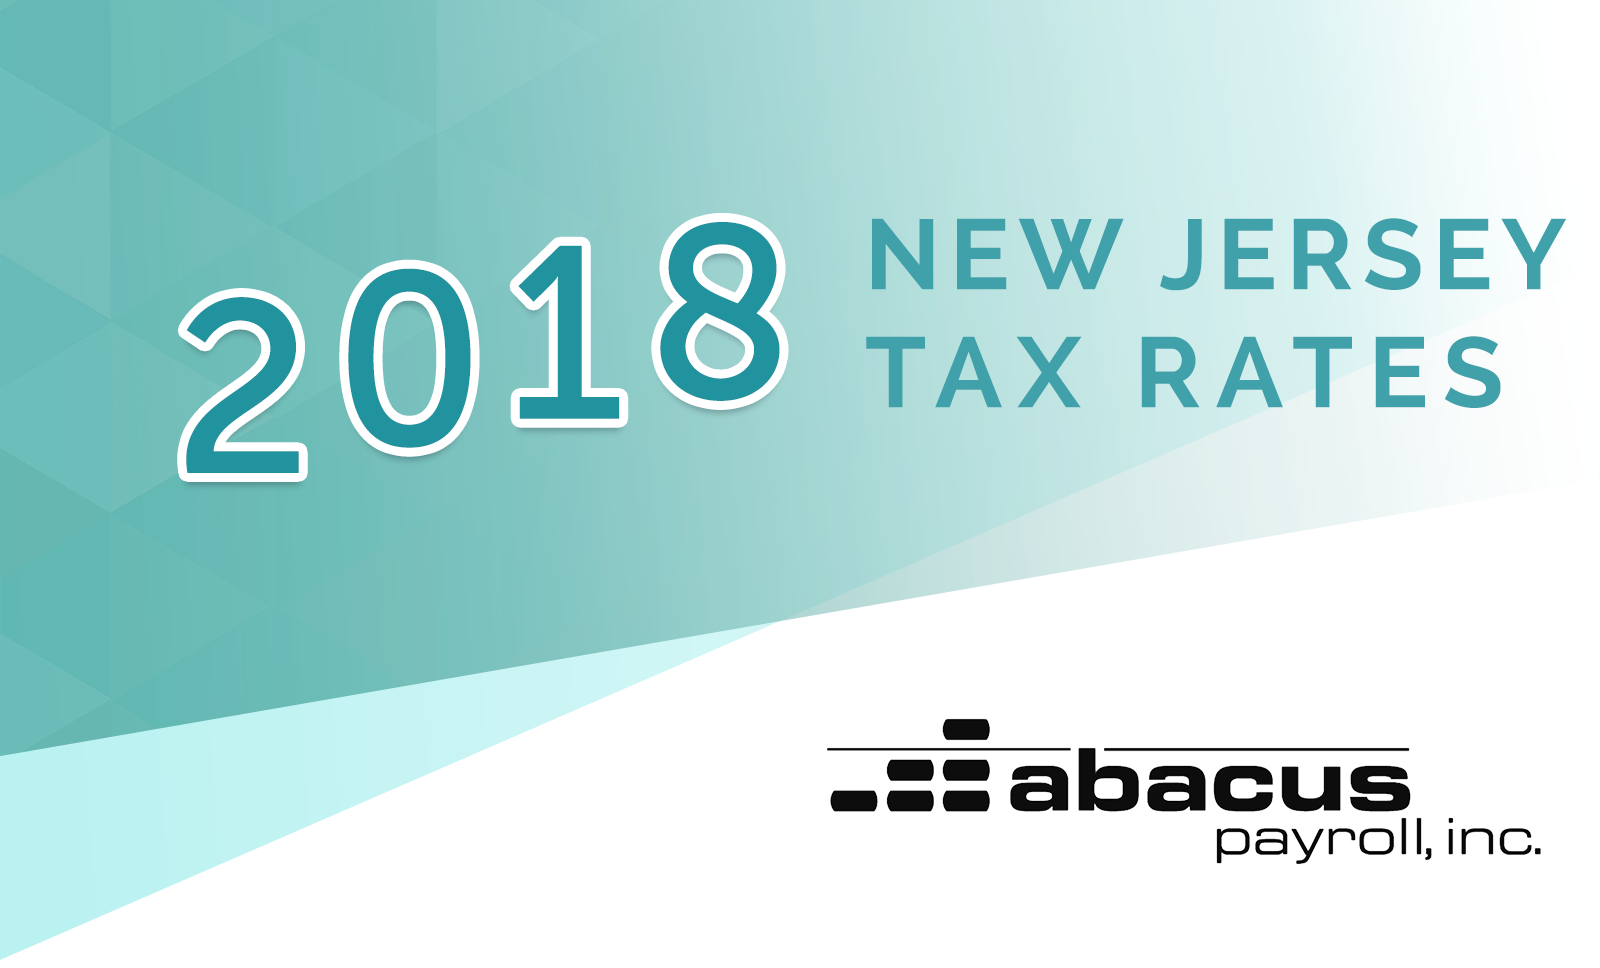 2018 new jersey payroll tax rates